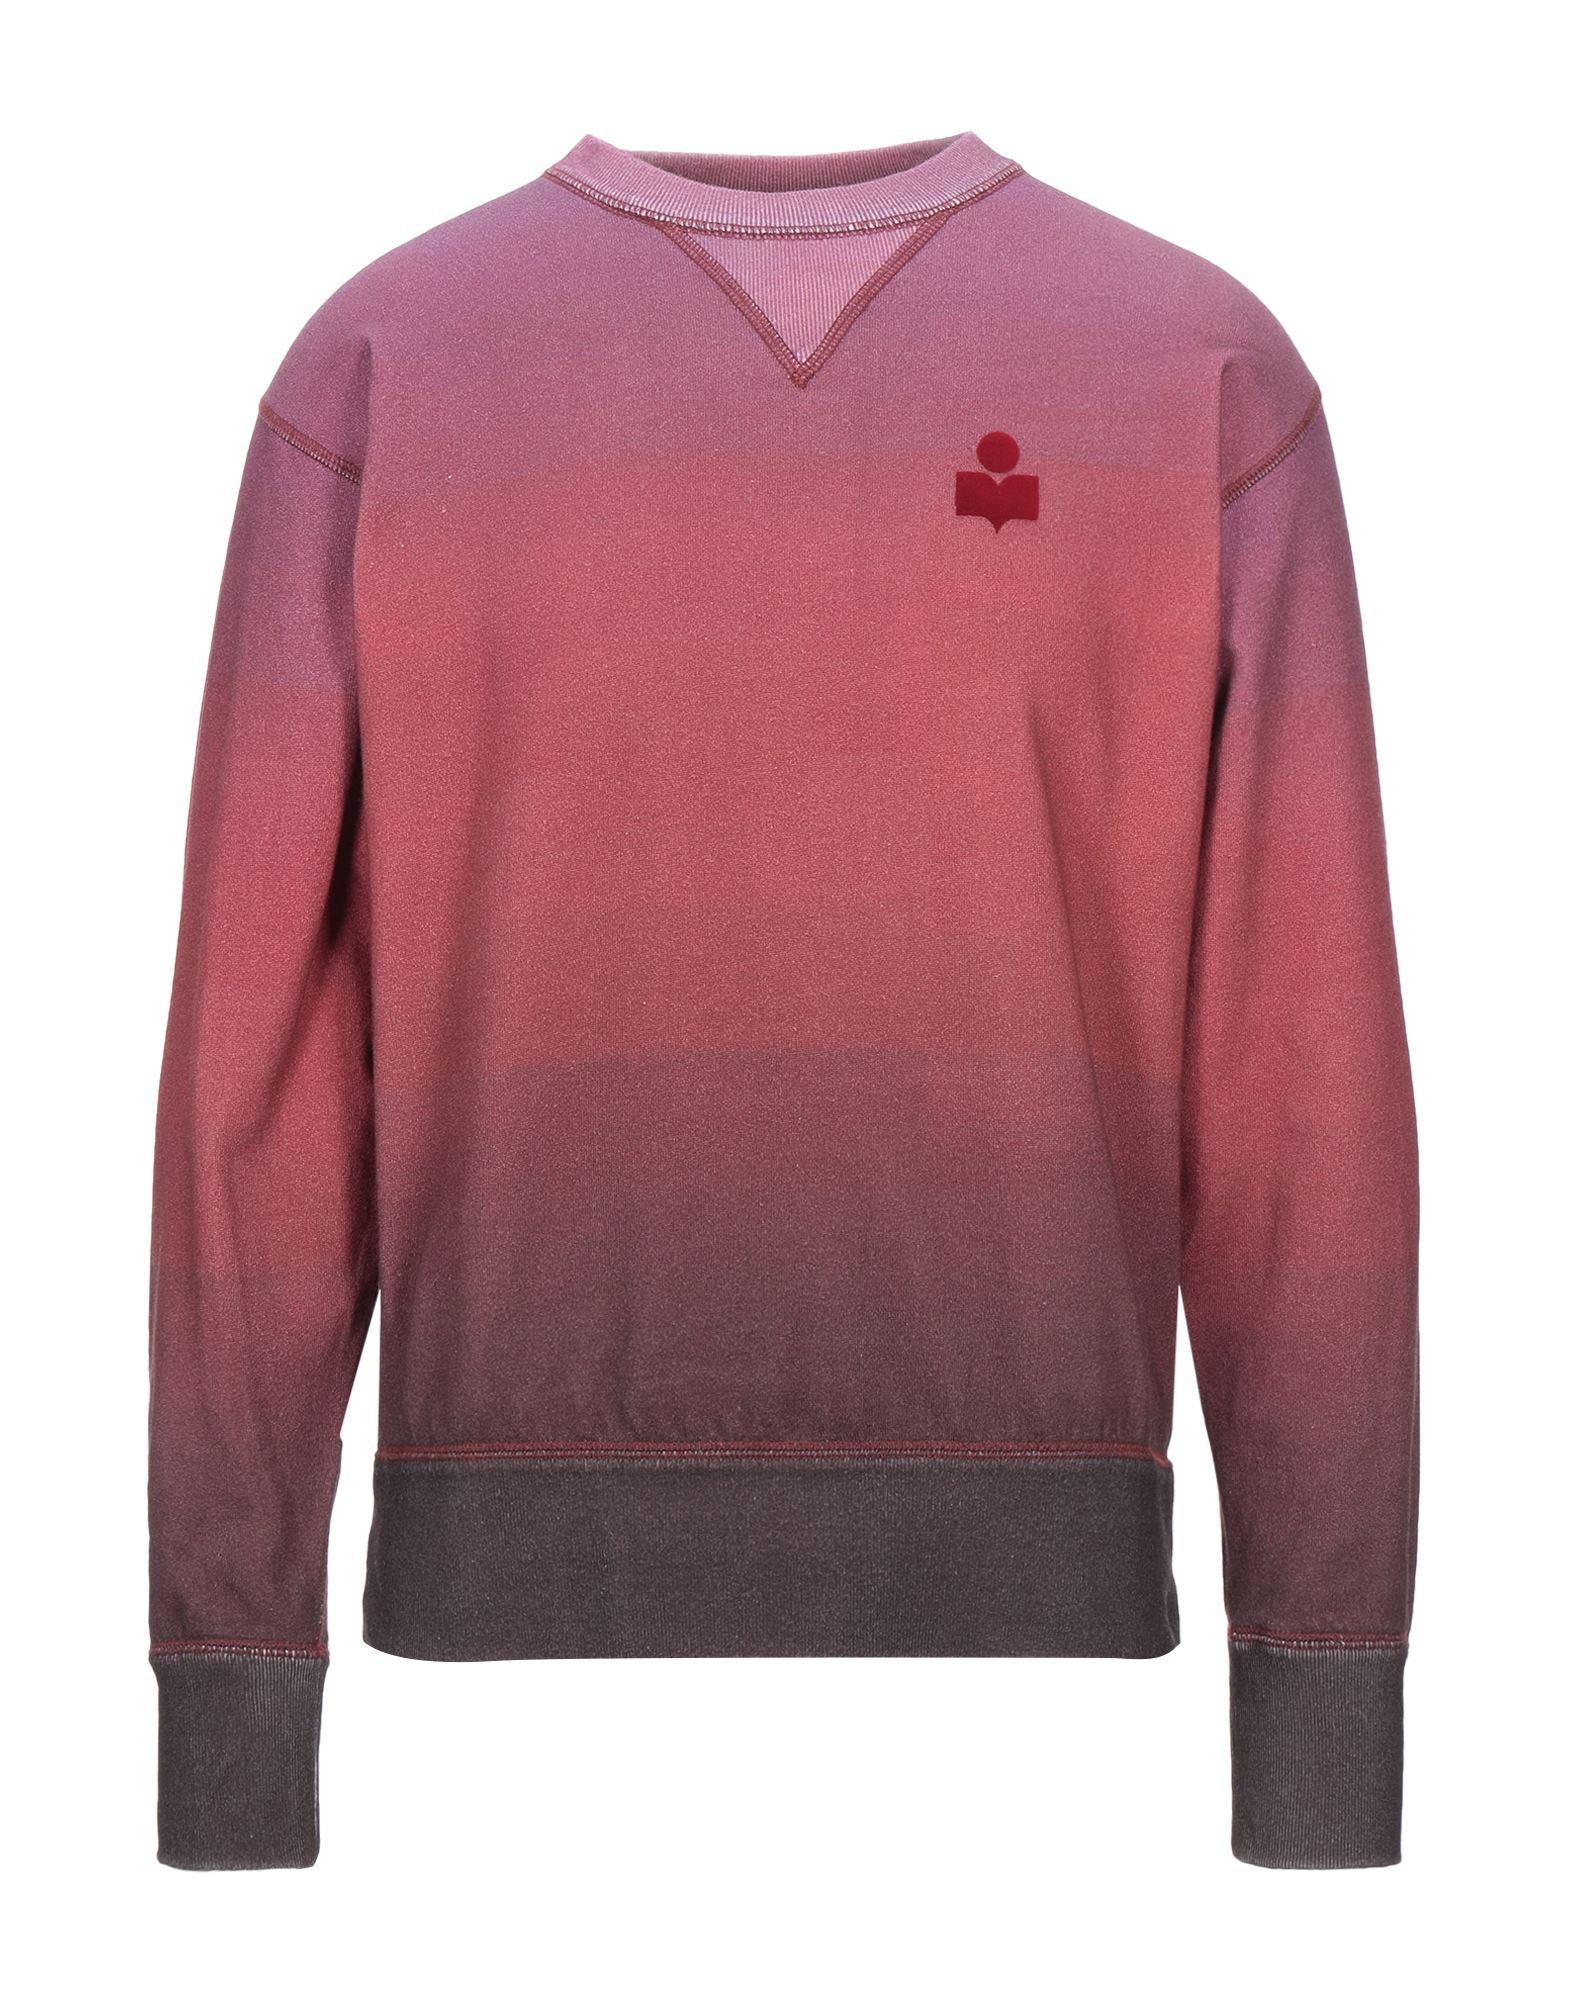 ISABEL MARANT Sweatshirts. sweatshirt fleece, logo, multicolor pattern, round collar, long sleeves, no pockets, fleece lining. 88% Cotton, 12% Polyester